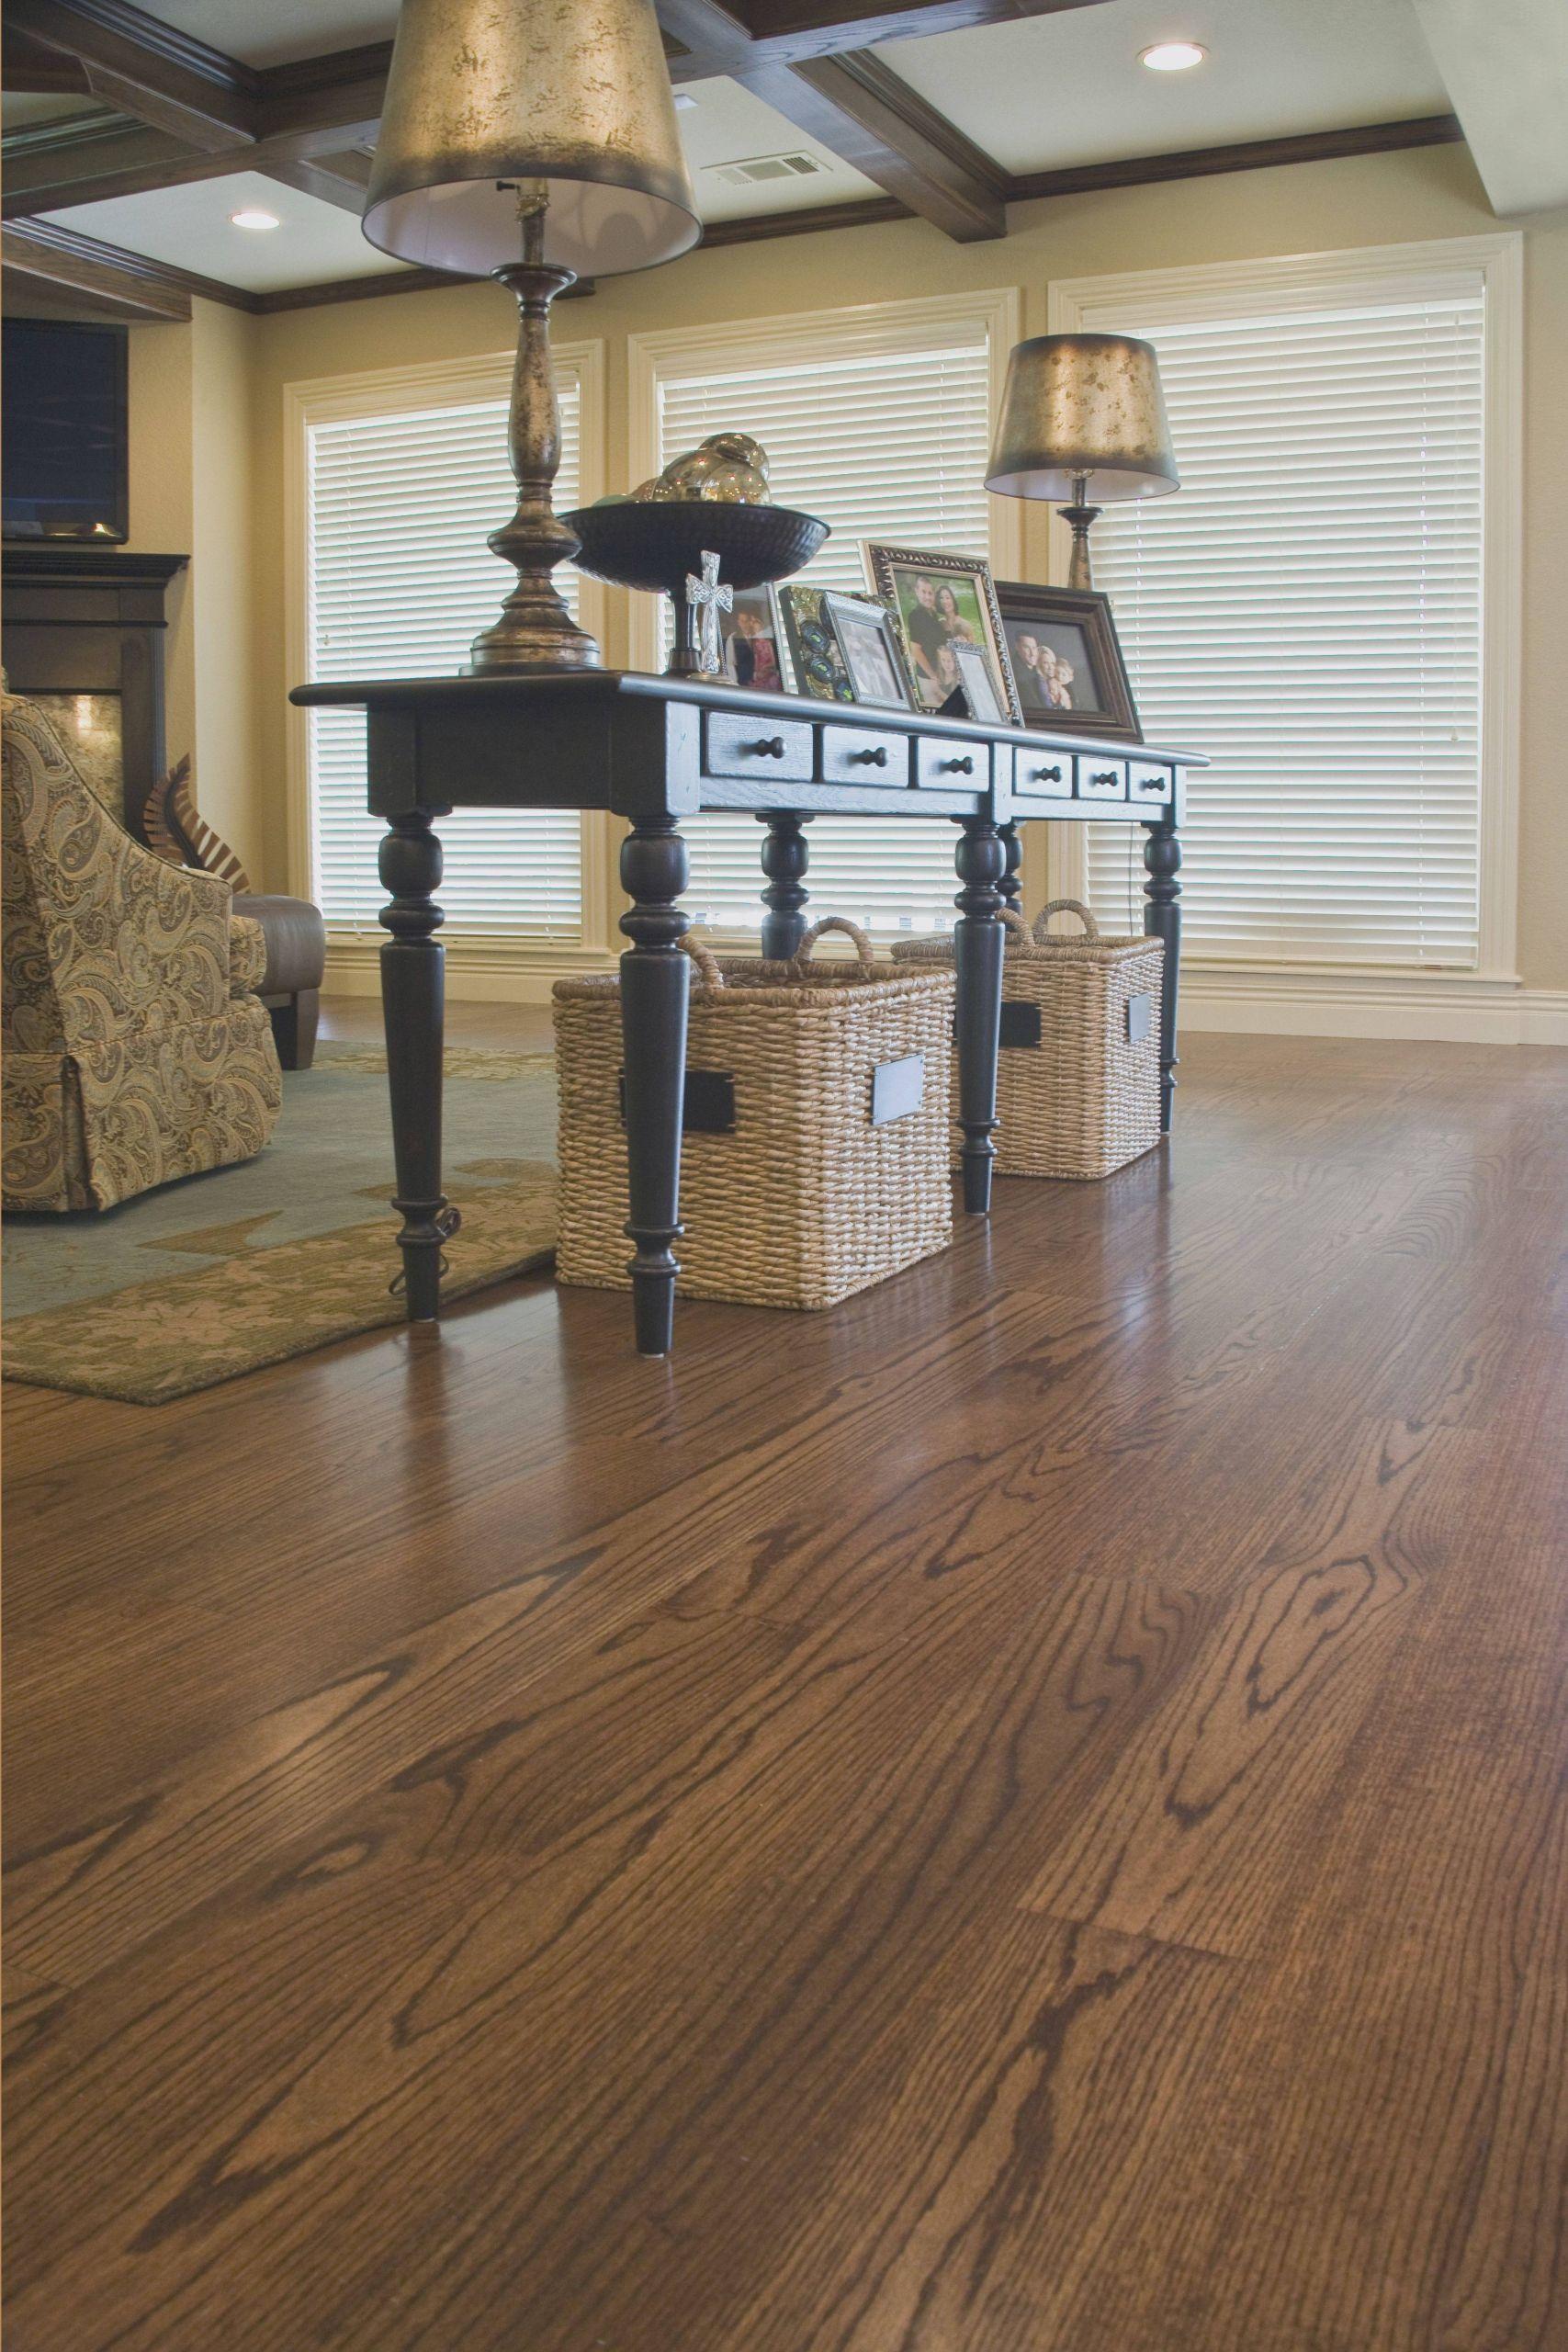 discount unfinished hardwood flooring of unfinished hardwood flooring feusd with regard to simple unfinished hardwood flooring home decor interior exterior wonderful at interior